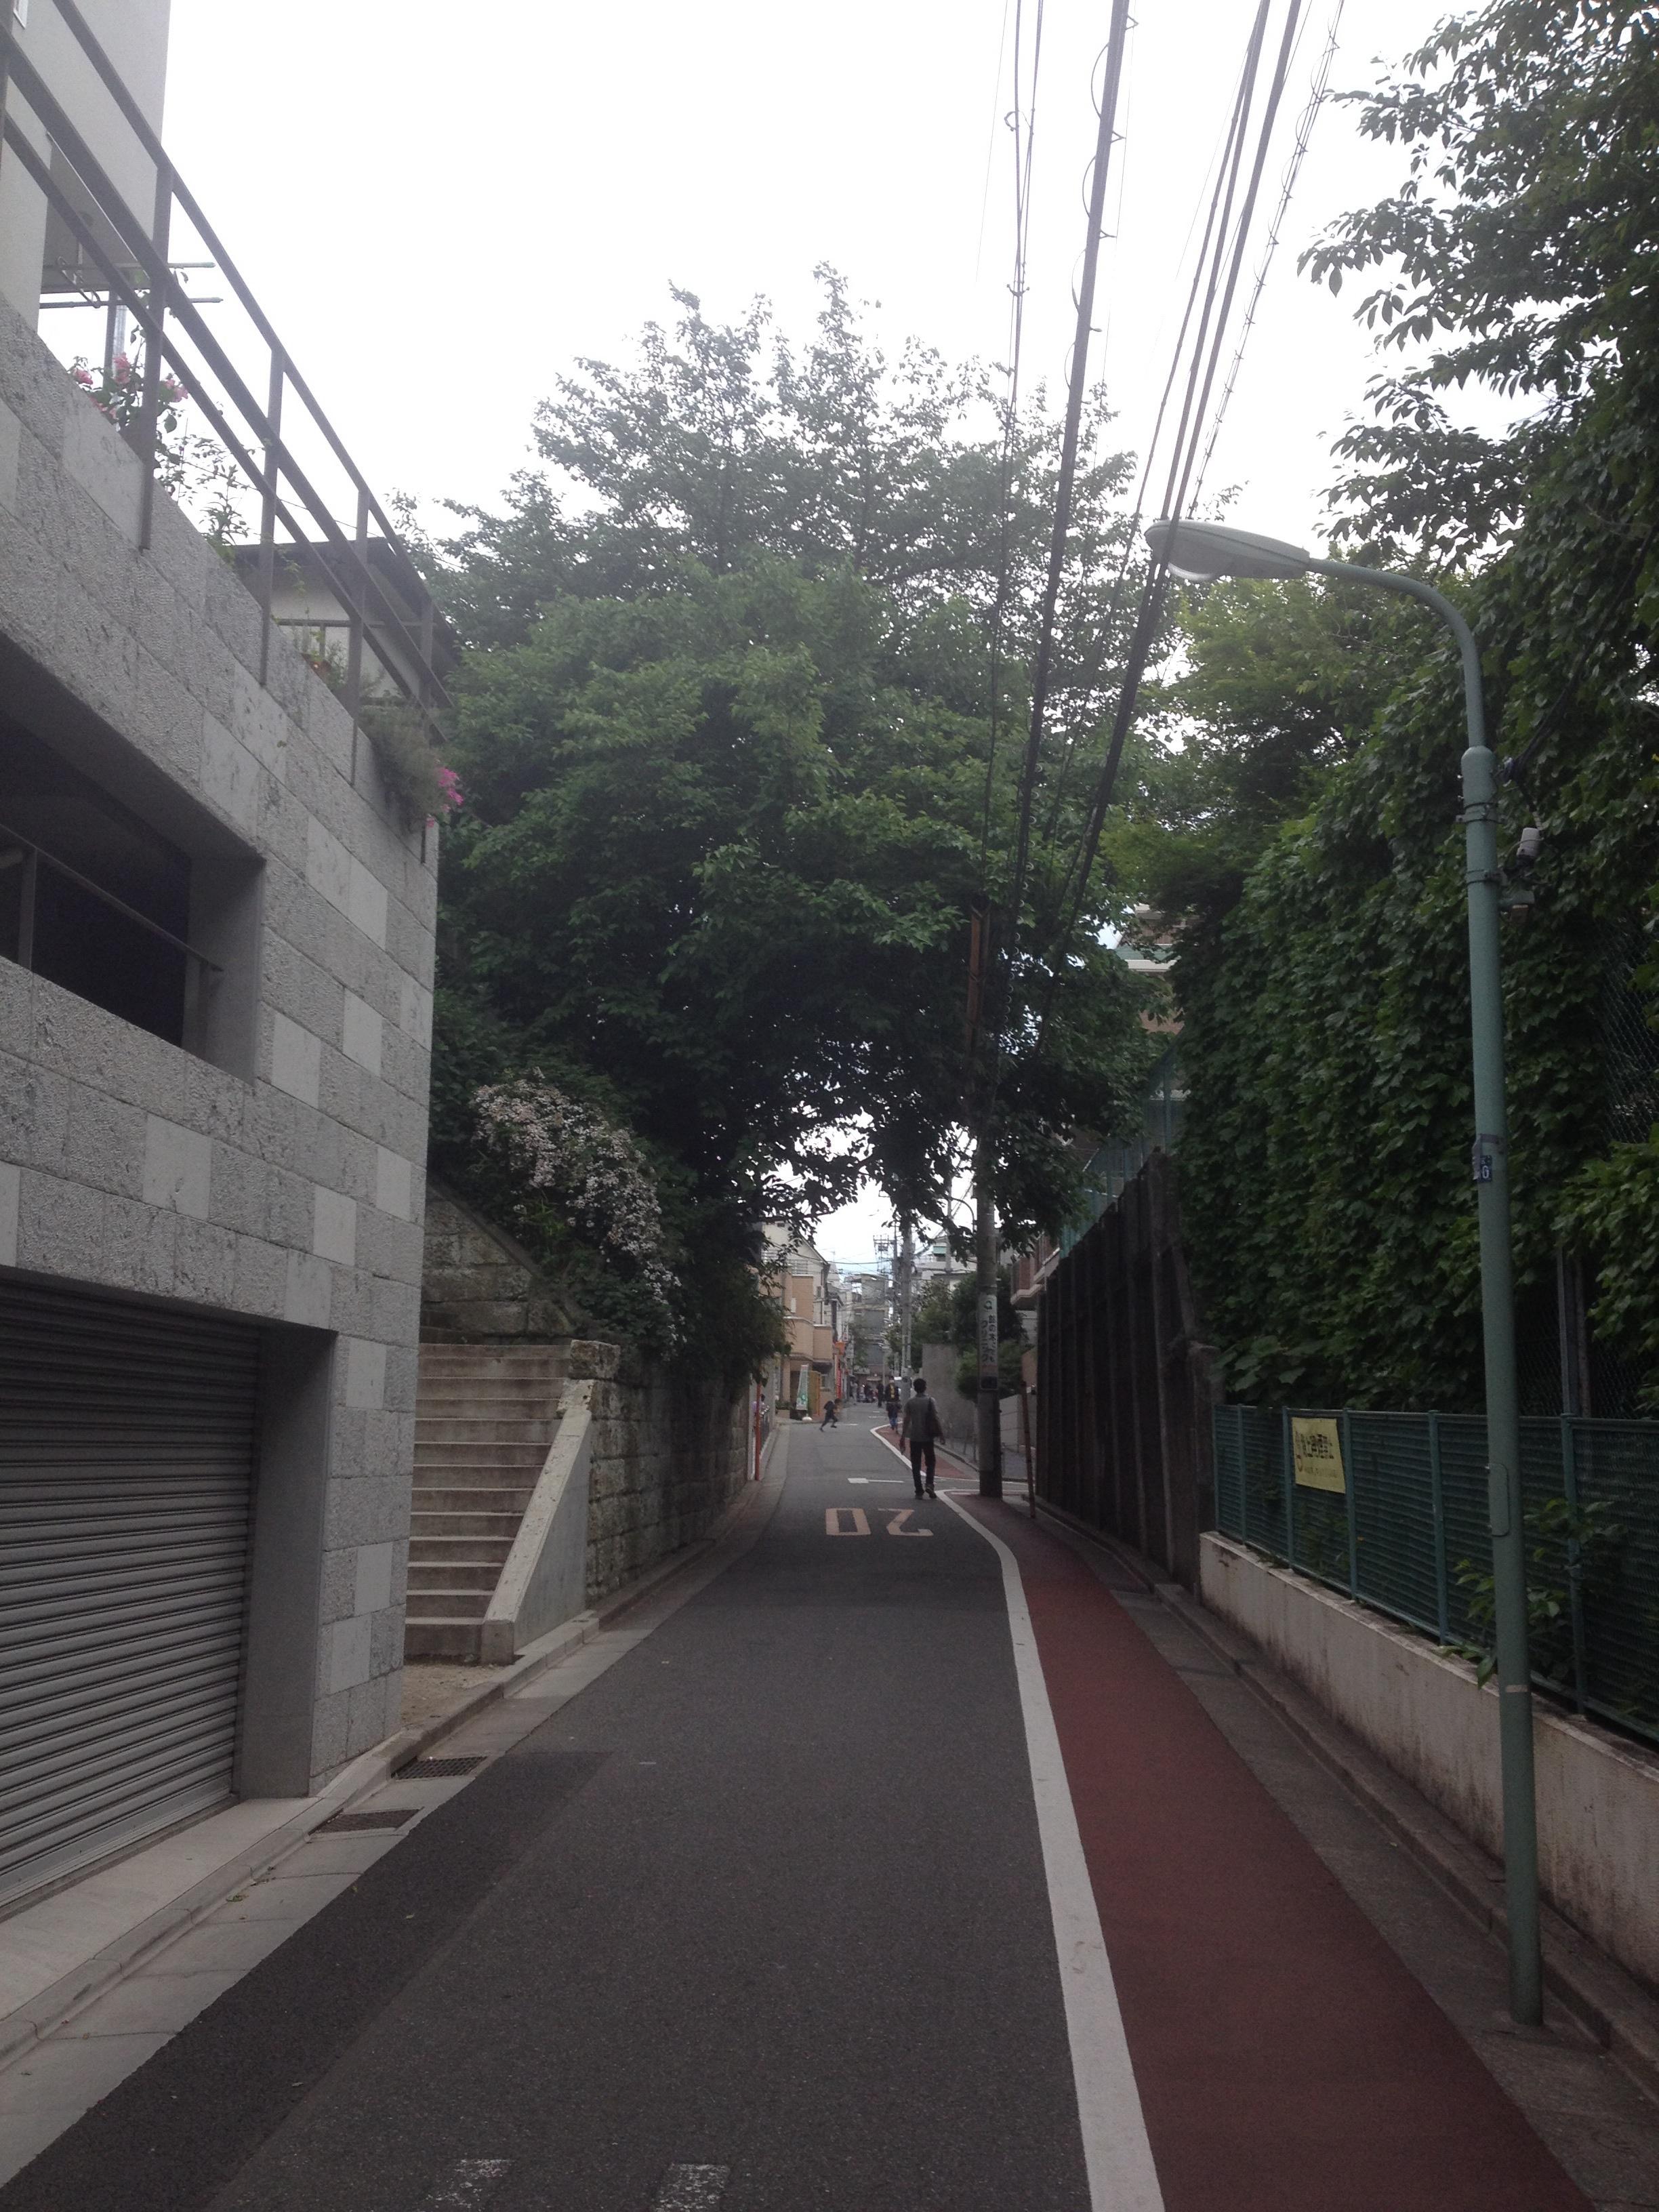 2014-05-12_15.19.40